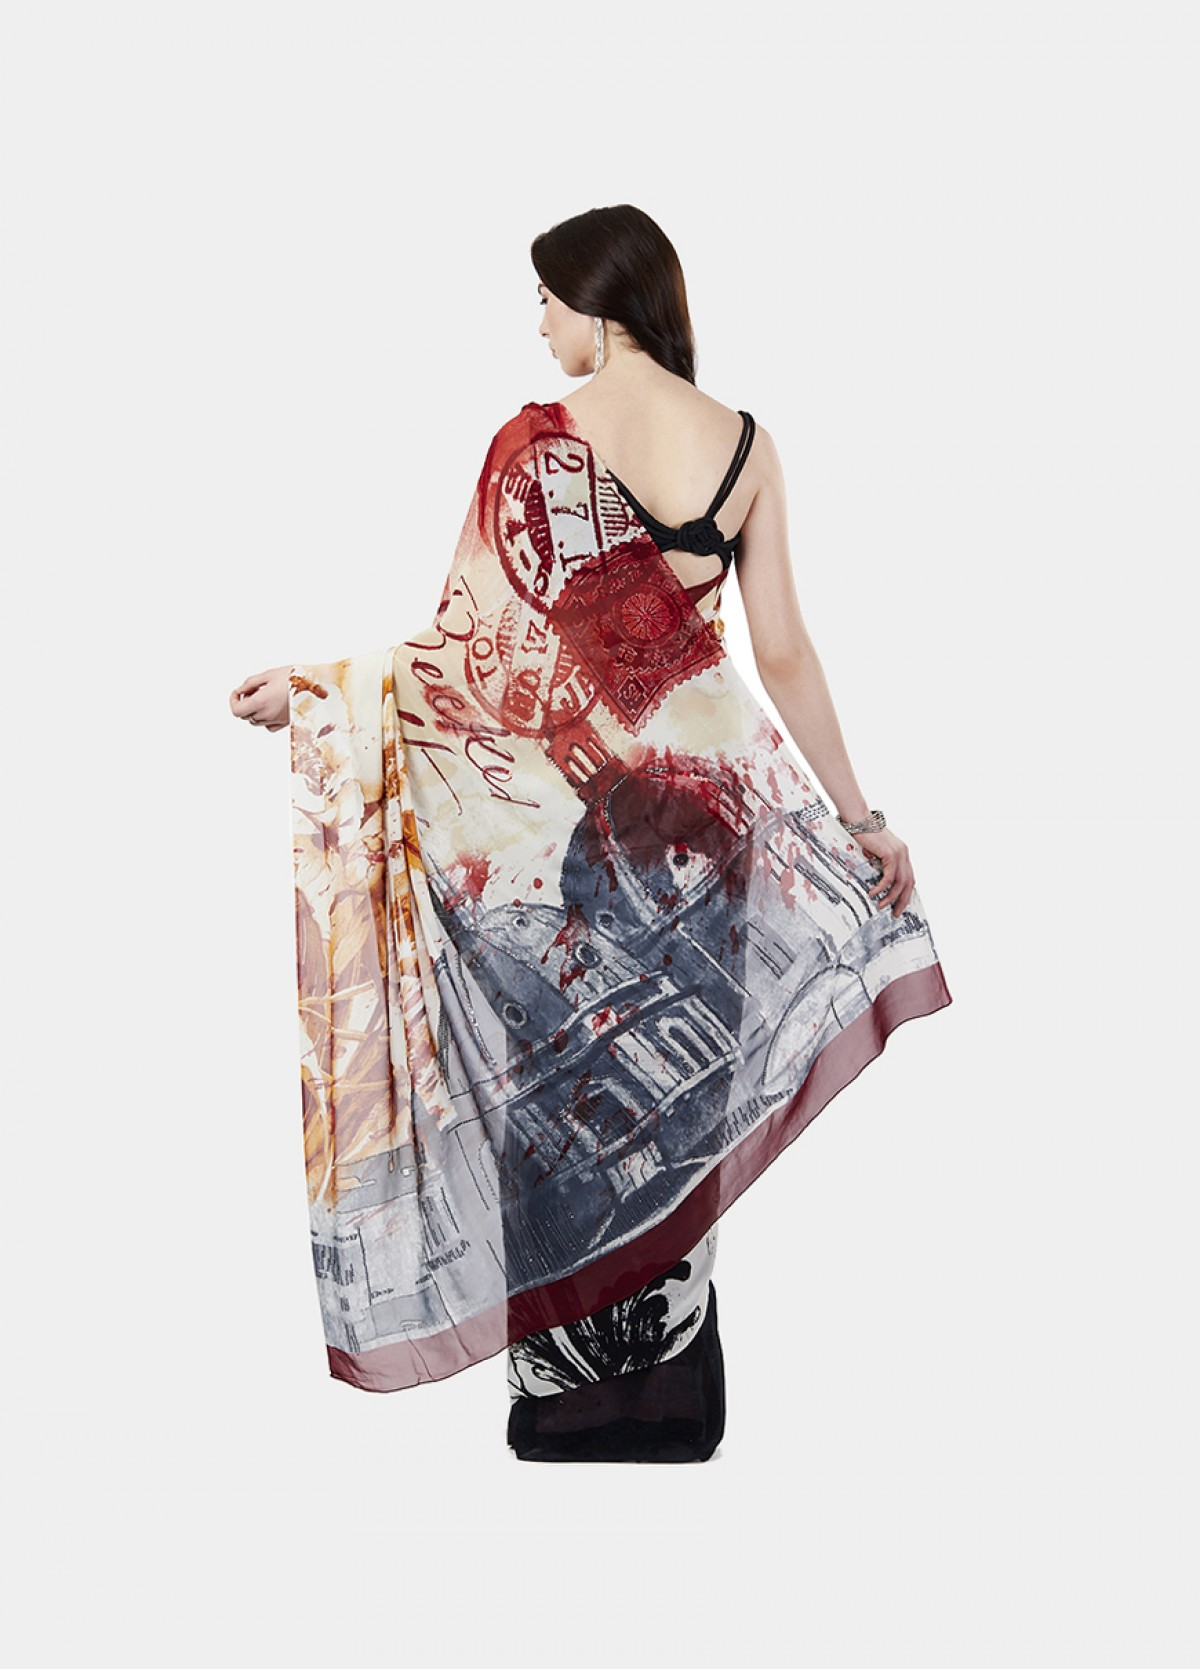 The Vintage Romance Sari